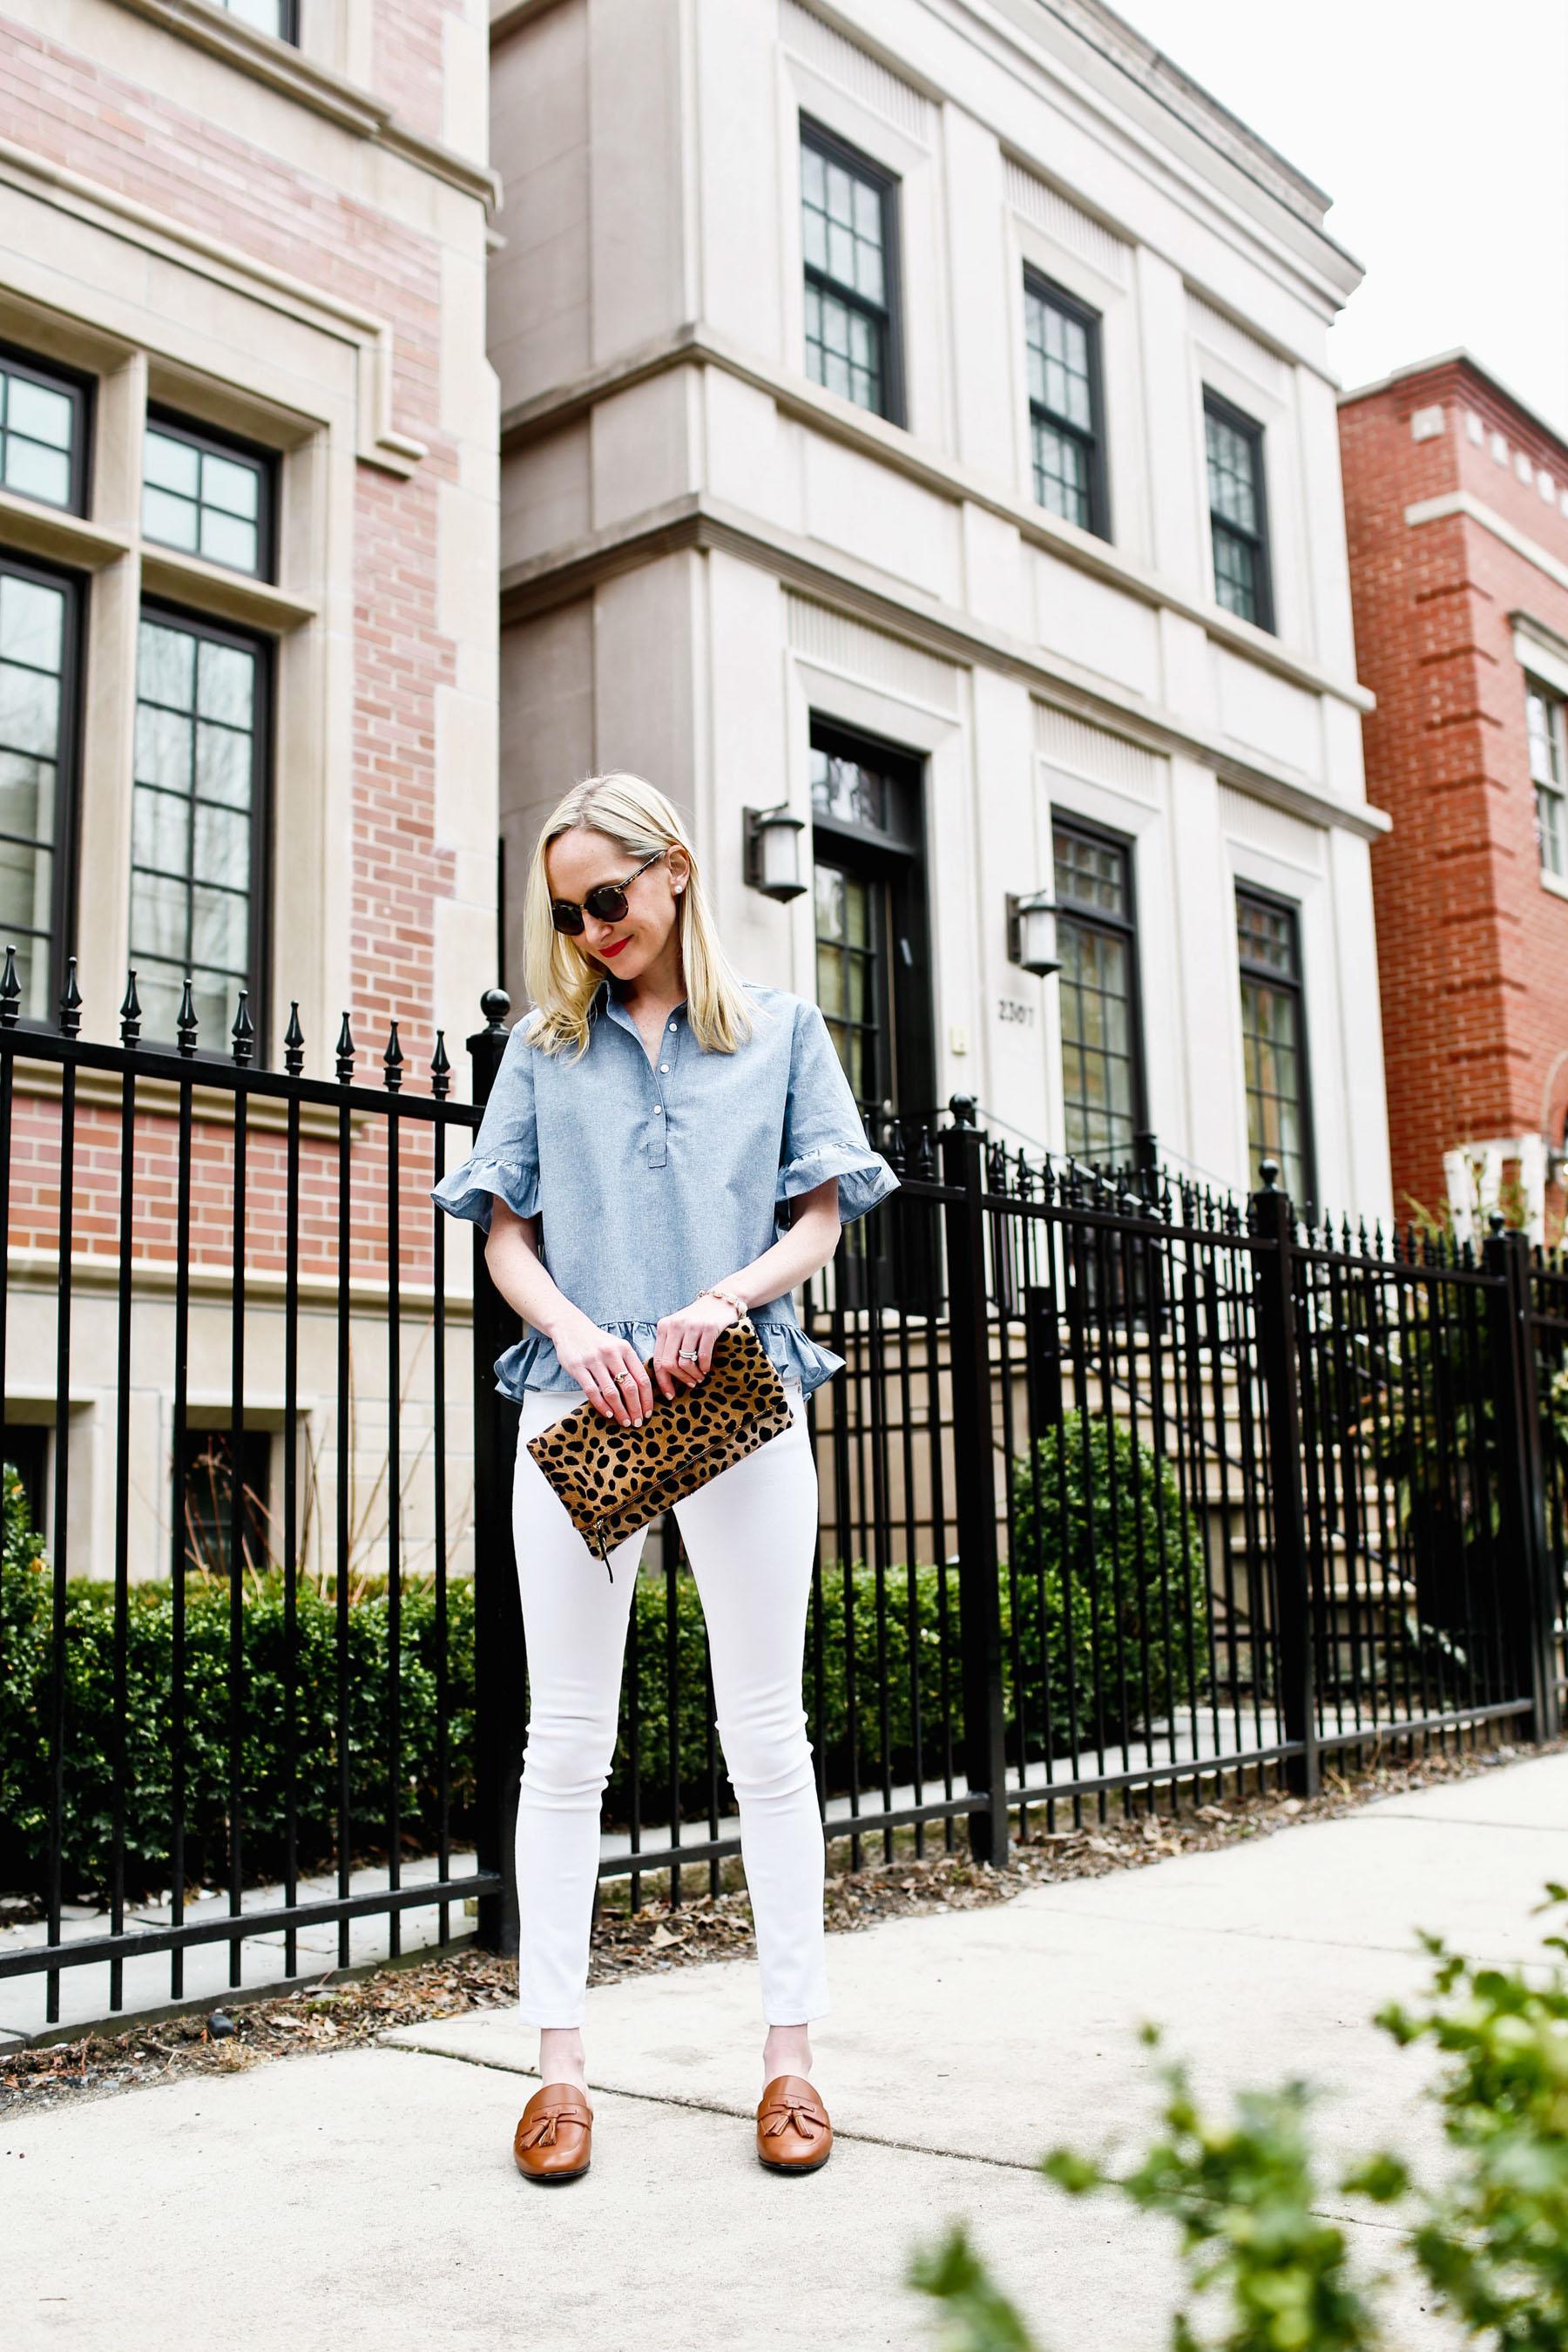 Chambray Ruffled Top / Rag & Bone Jeans / Sam Edelman Loafers / Clare V. Clutch / Kendra Scott Bracelet